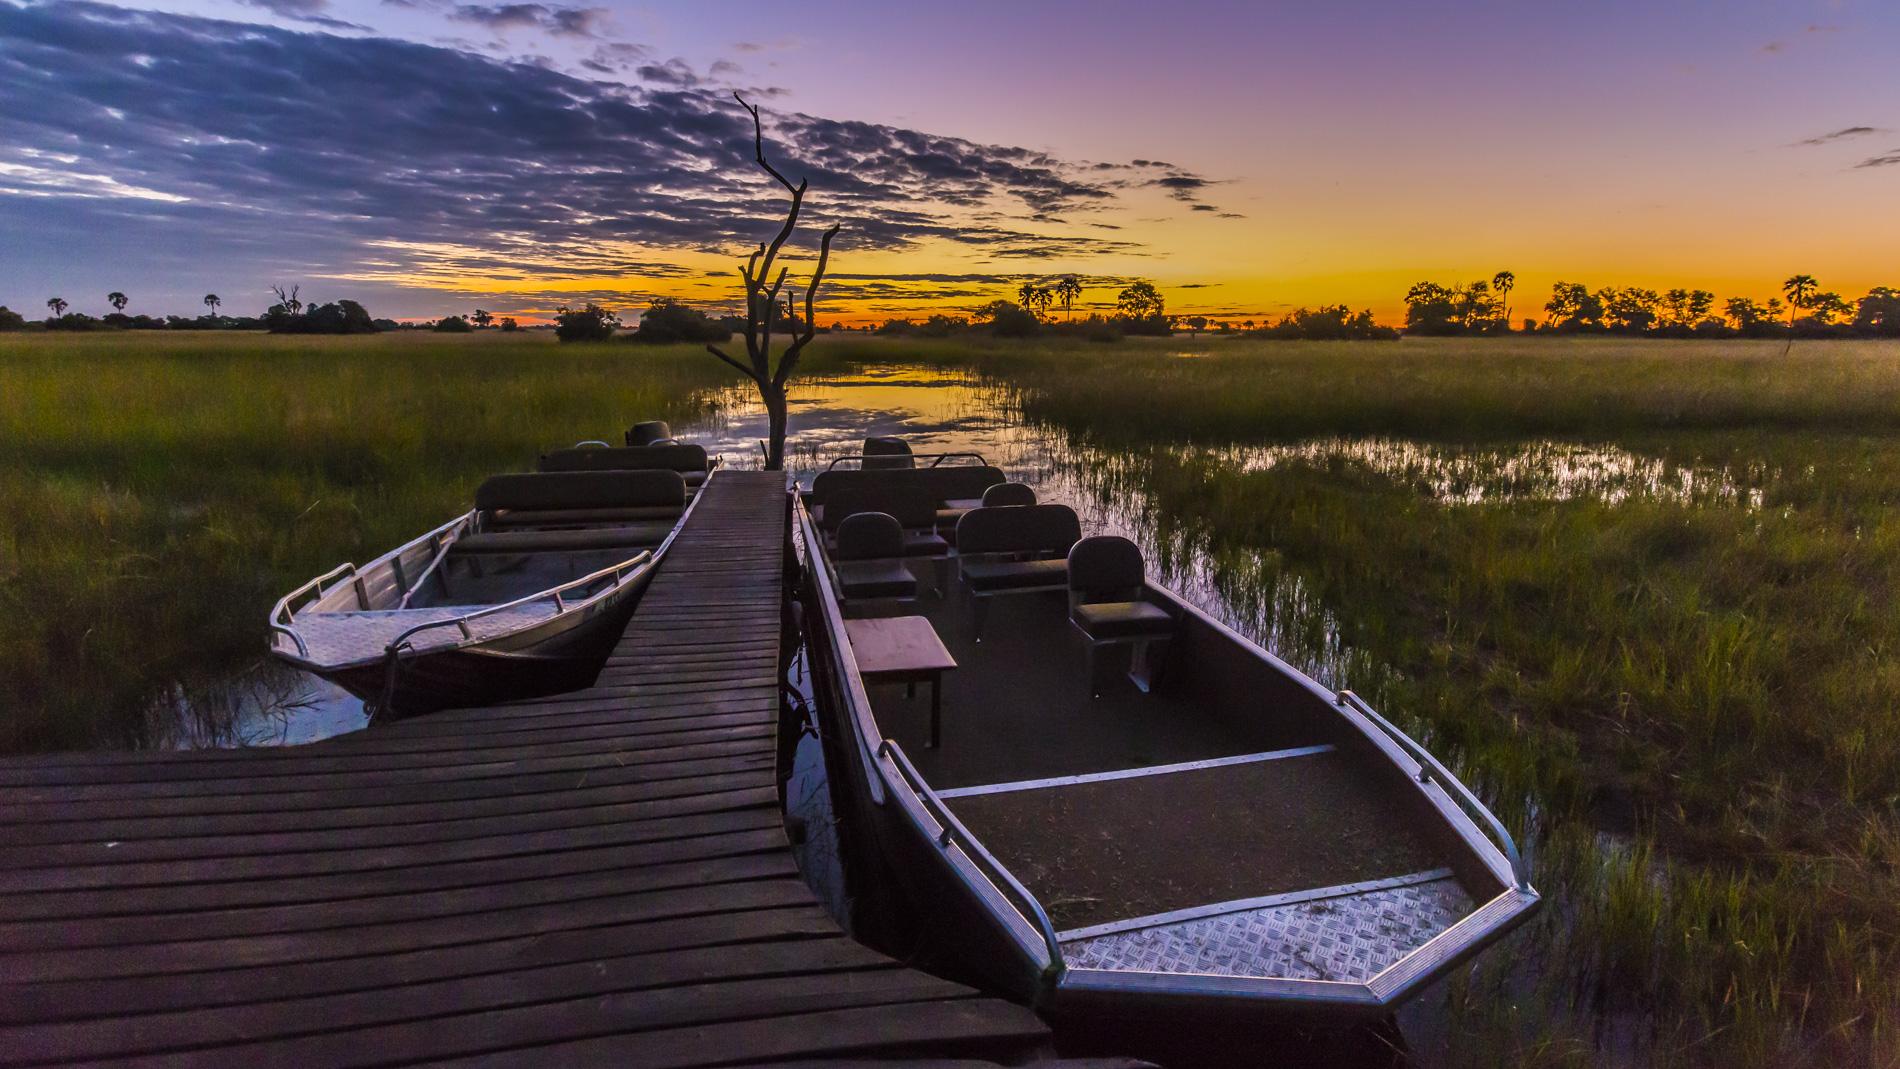 Sunset at Macatoo Camp Okavango